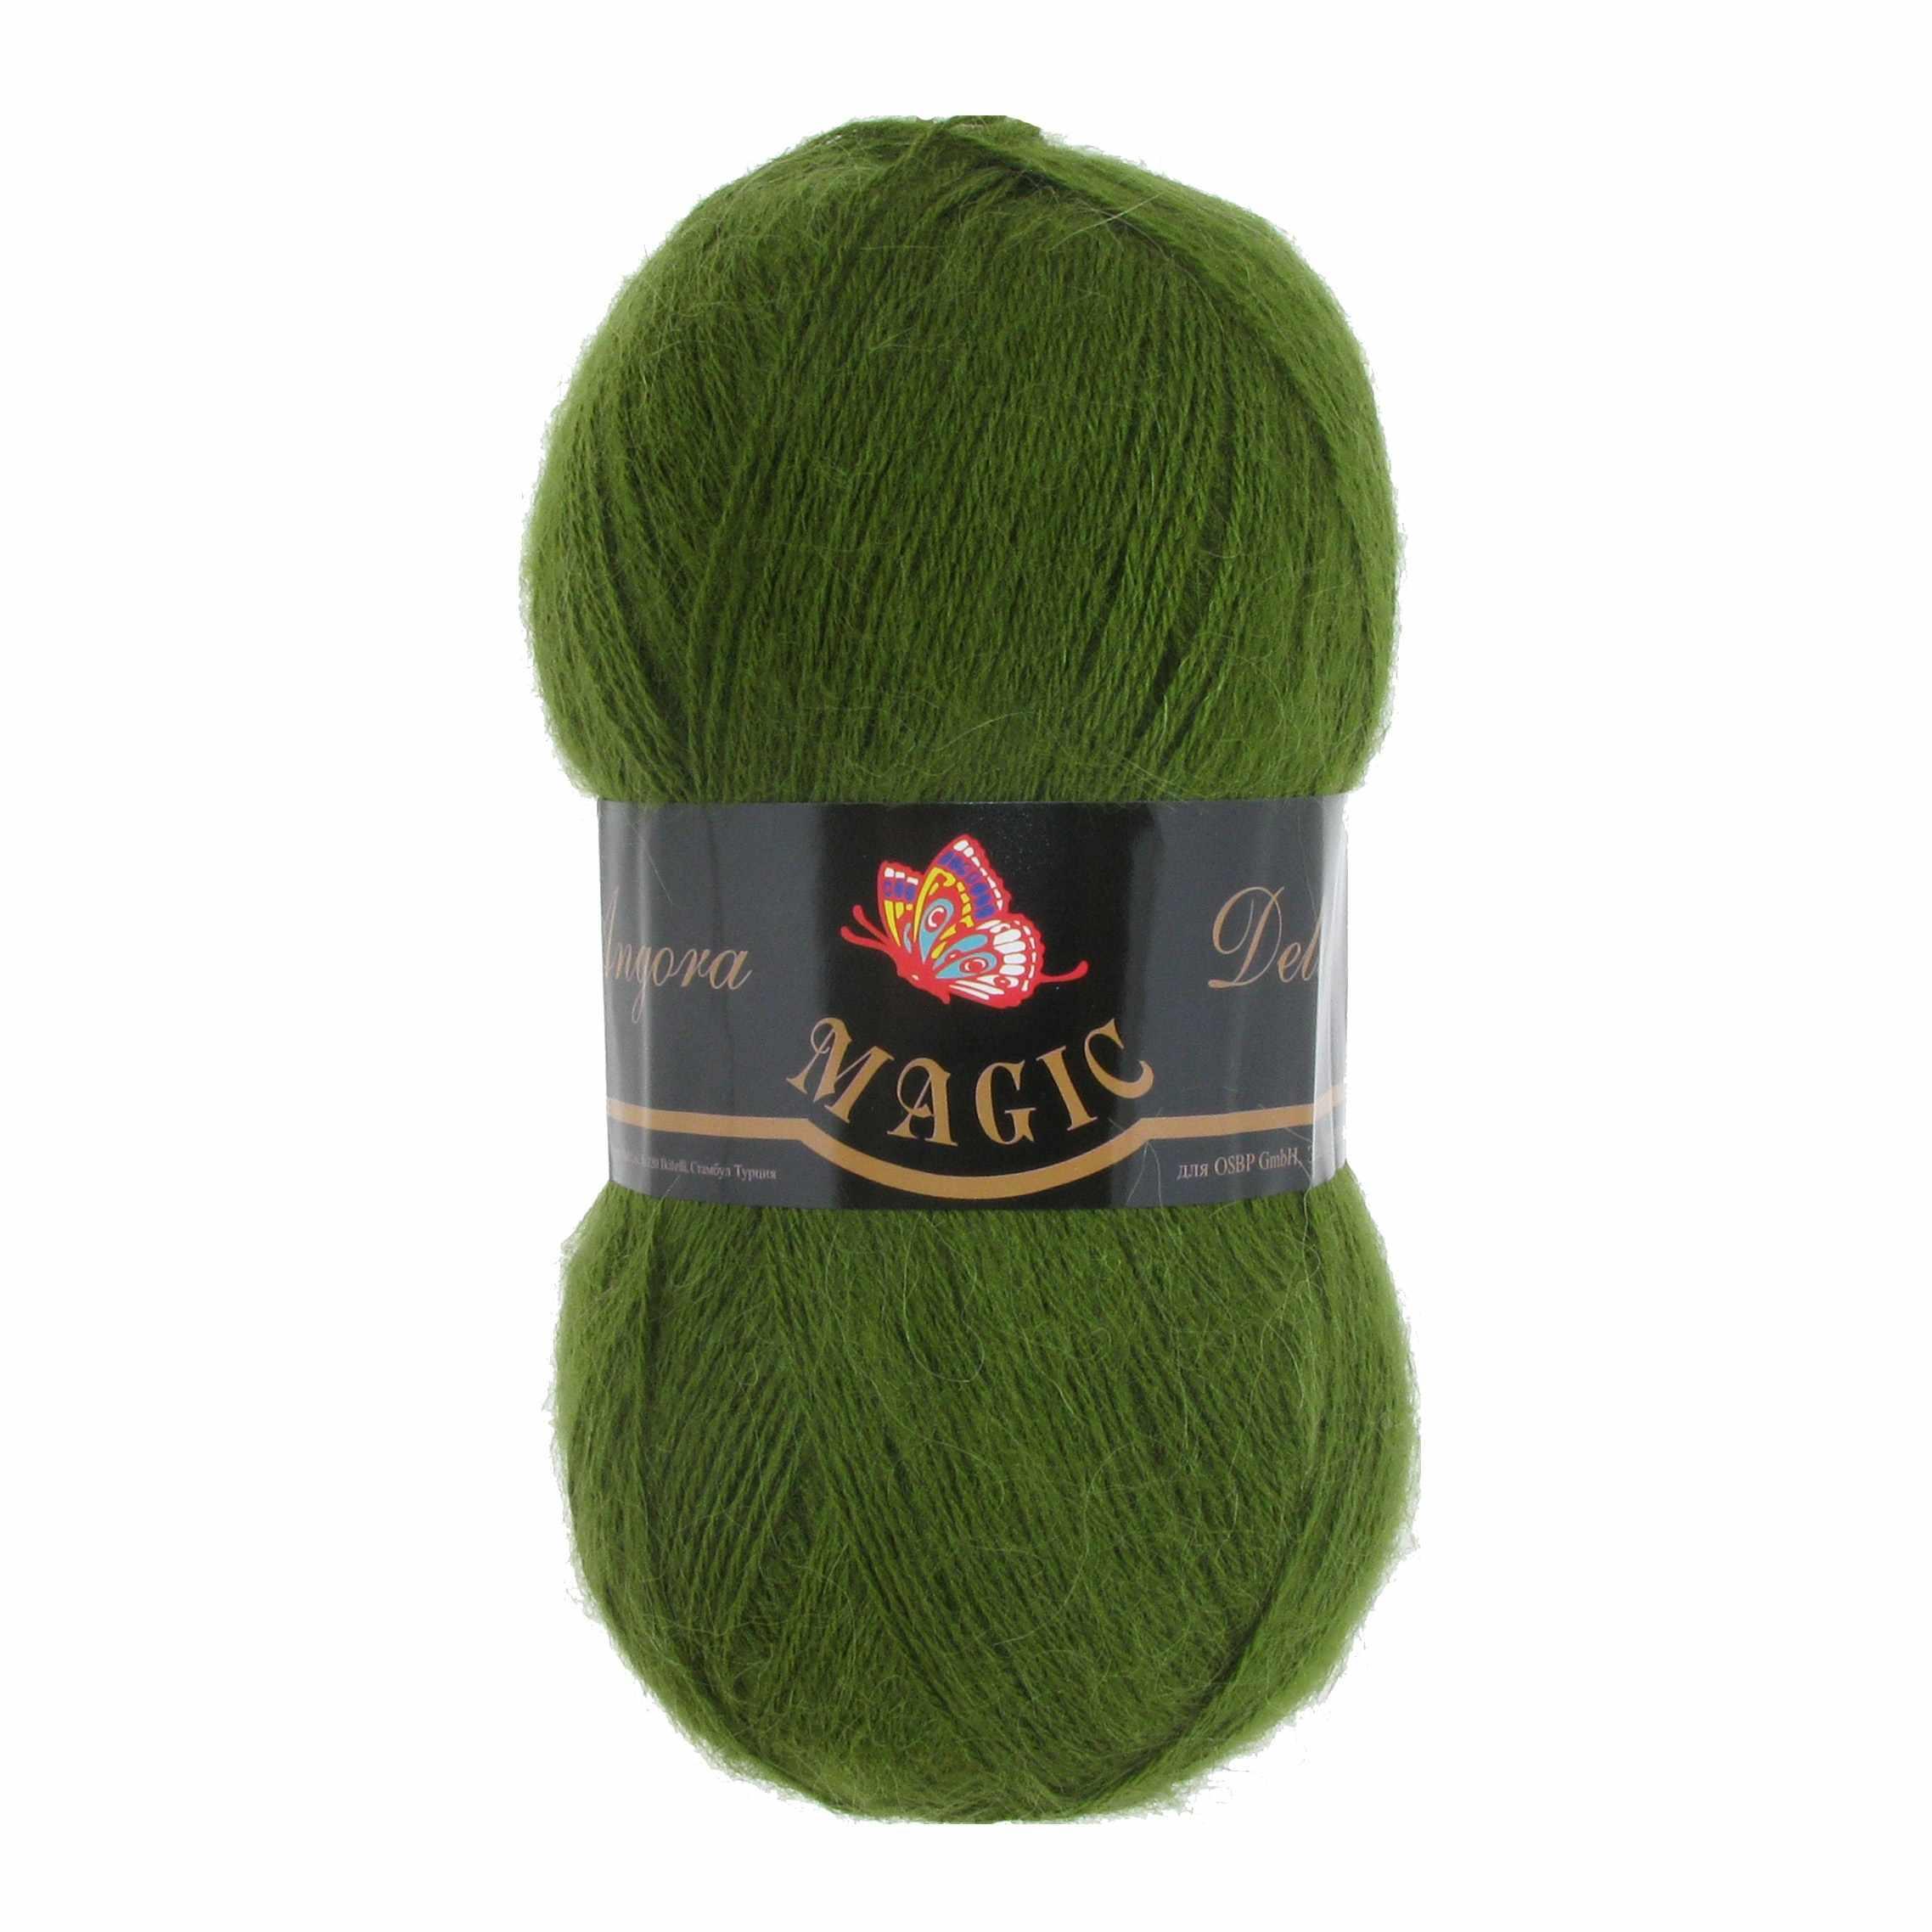 Пряжа Magic Angora Delicate Цвет.1108 Зеленый кедр